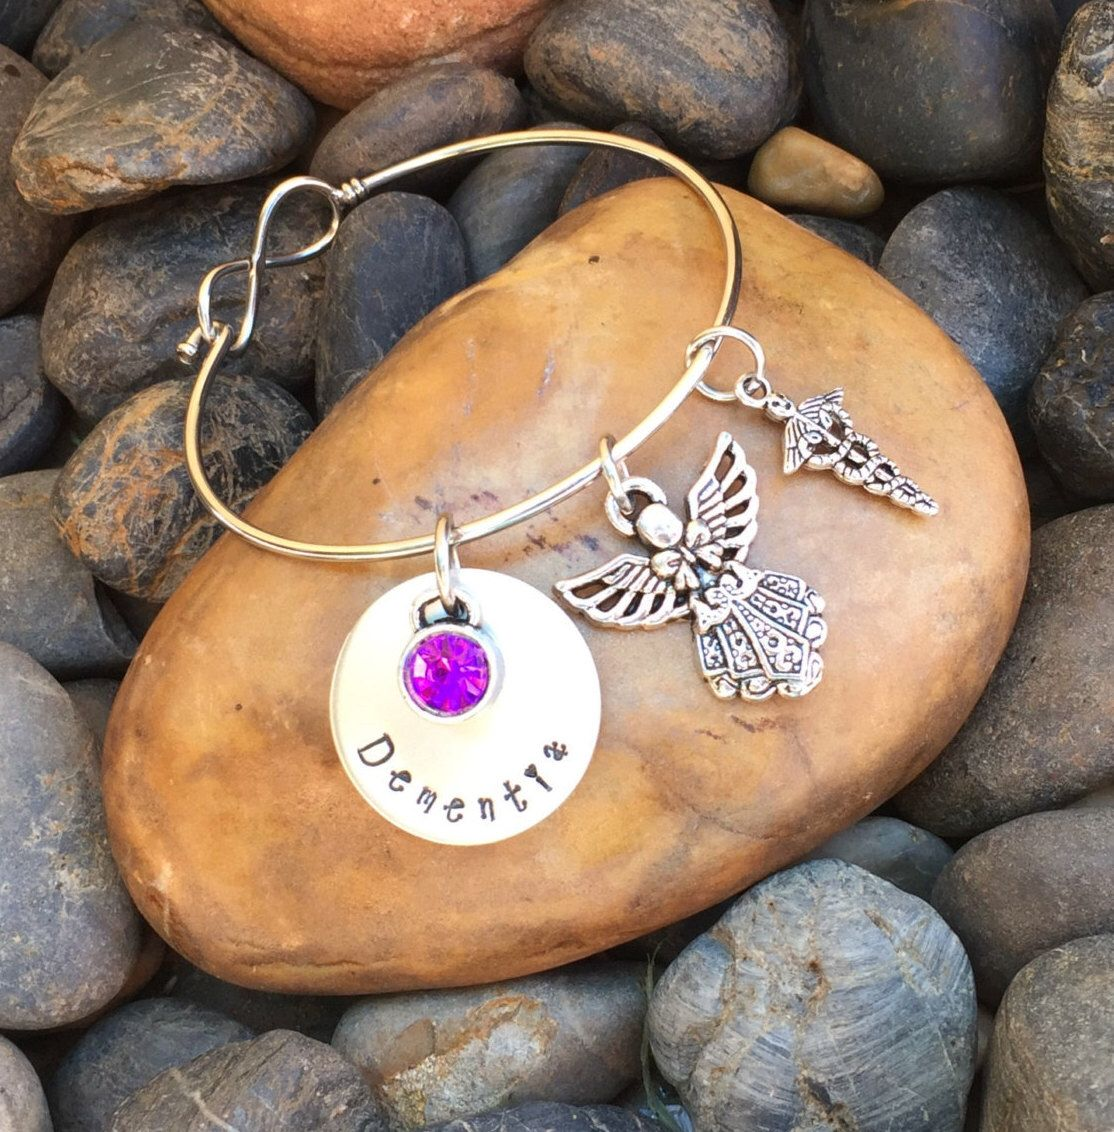 Dementia Bracelet | Dementia Jewelry | Medical Alert Bracelet | Medical Alert Jewelry | Dementia Awareness Gift | The Purple Angel Jewelry by SecretHillStudio on Etsy https://www.etsy.com/listing/463760881/dementia-bracelet-dementia-jewelry